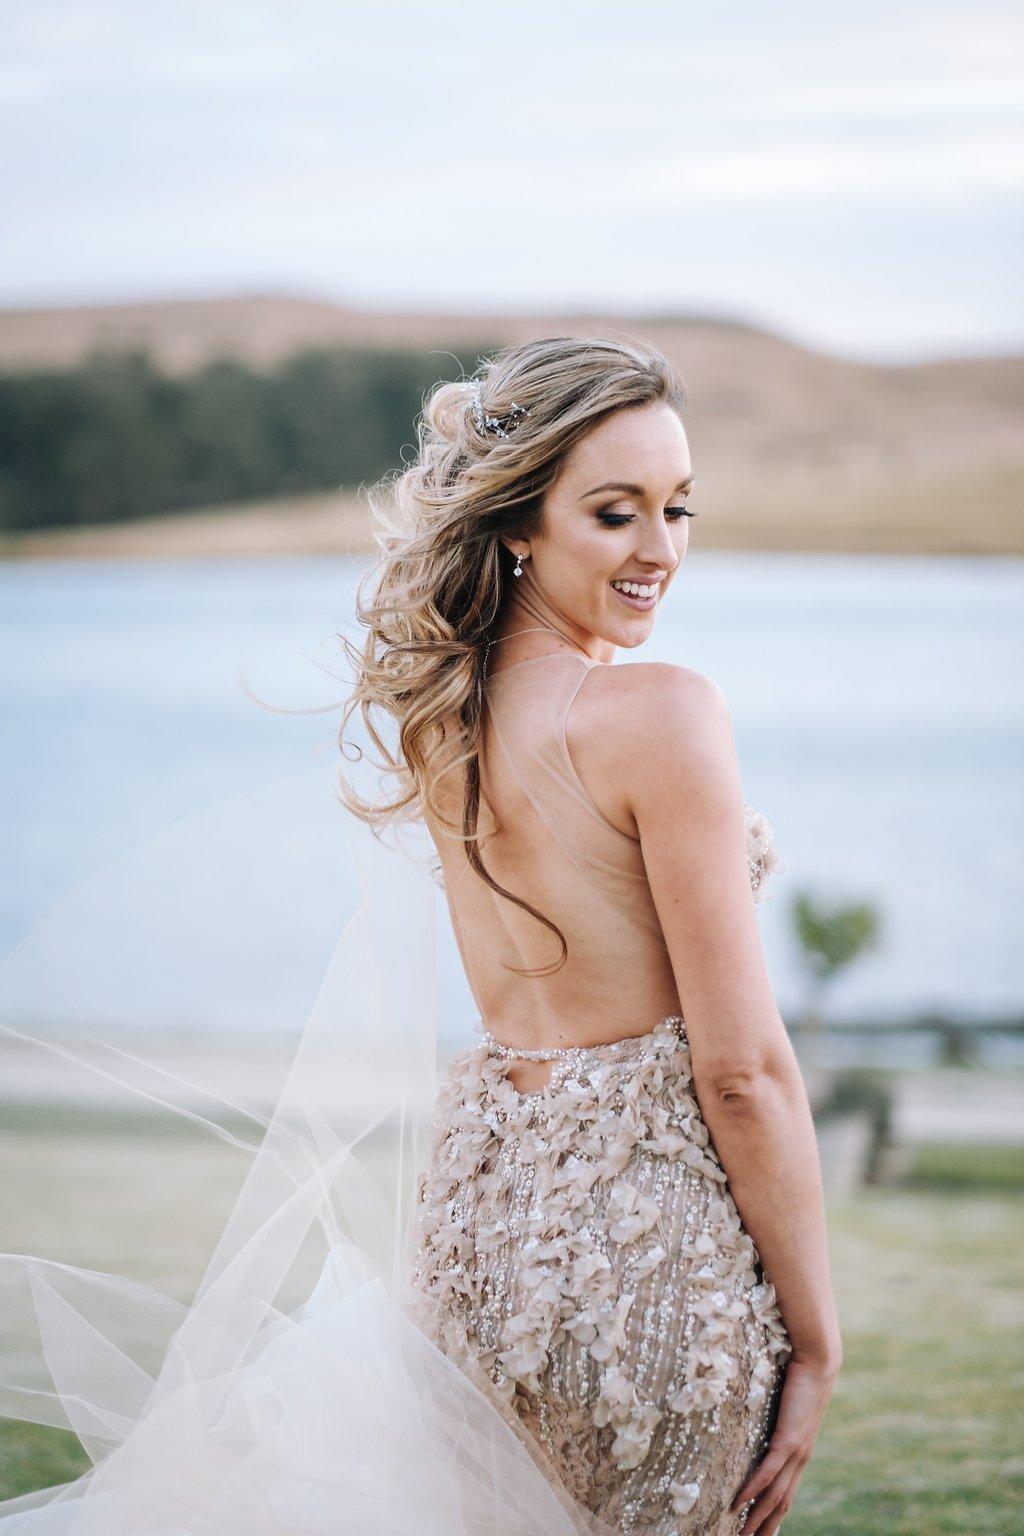 Embellished Champagne Bridal Reception Dress | Image: The Shank Tank